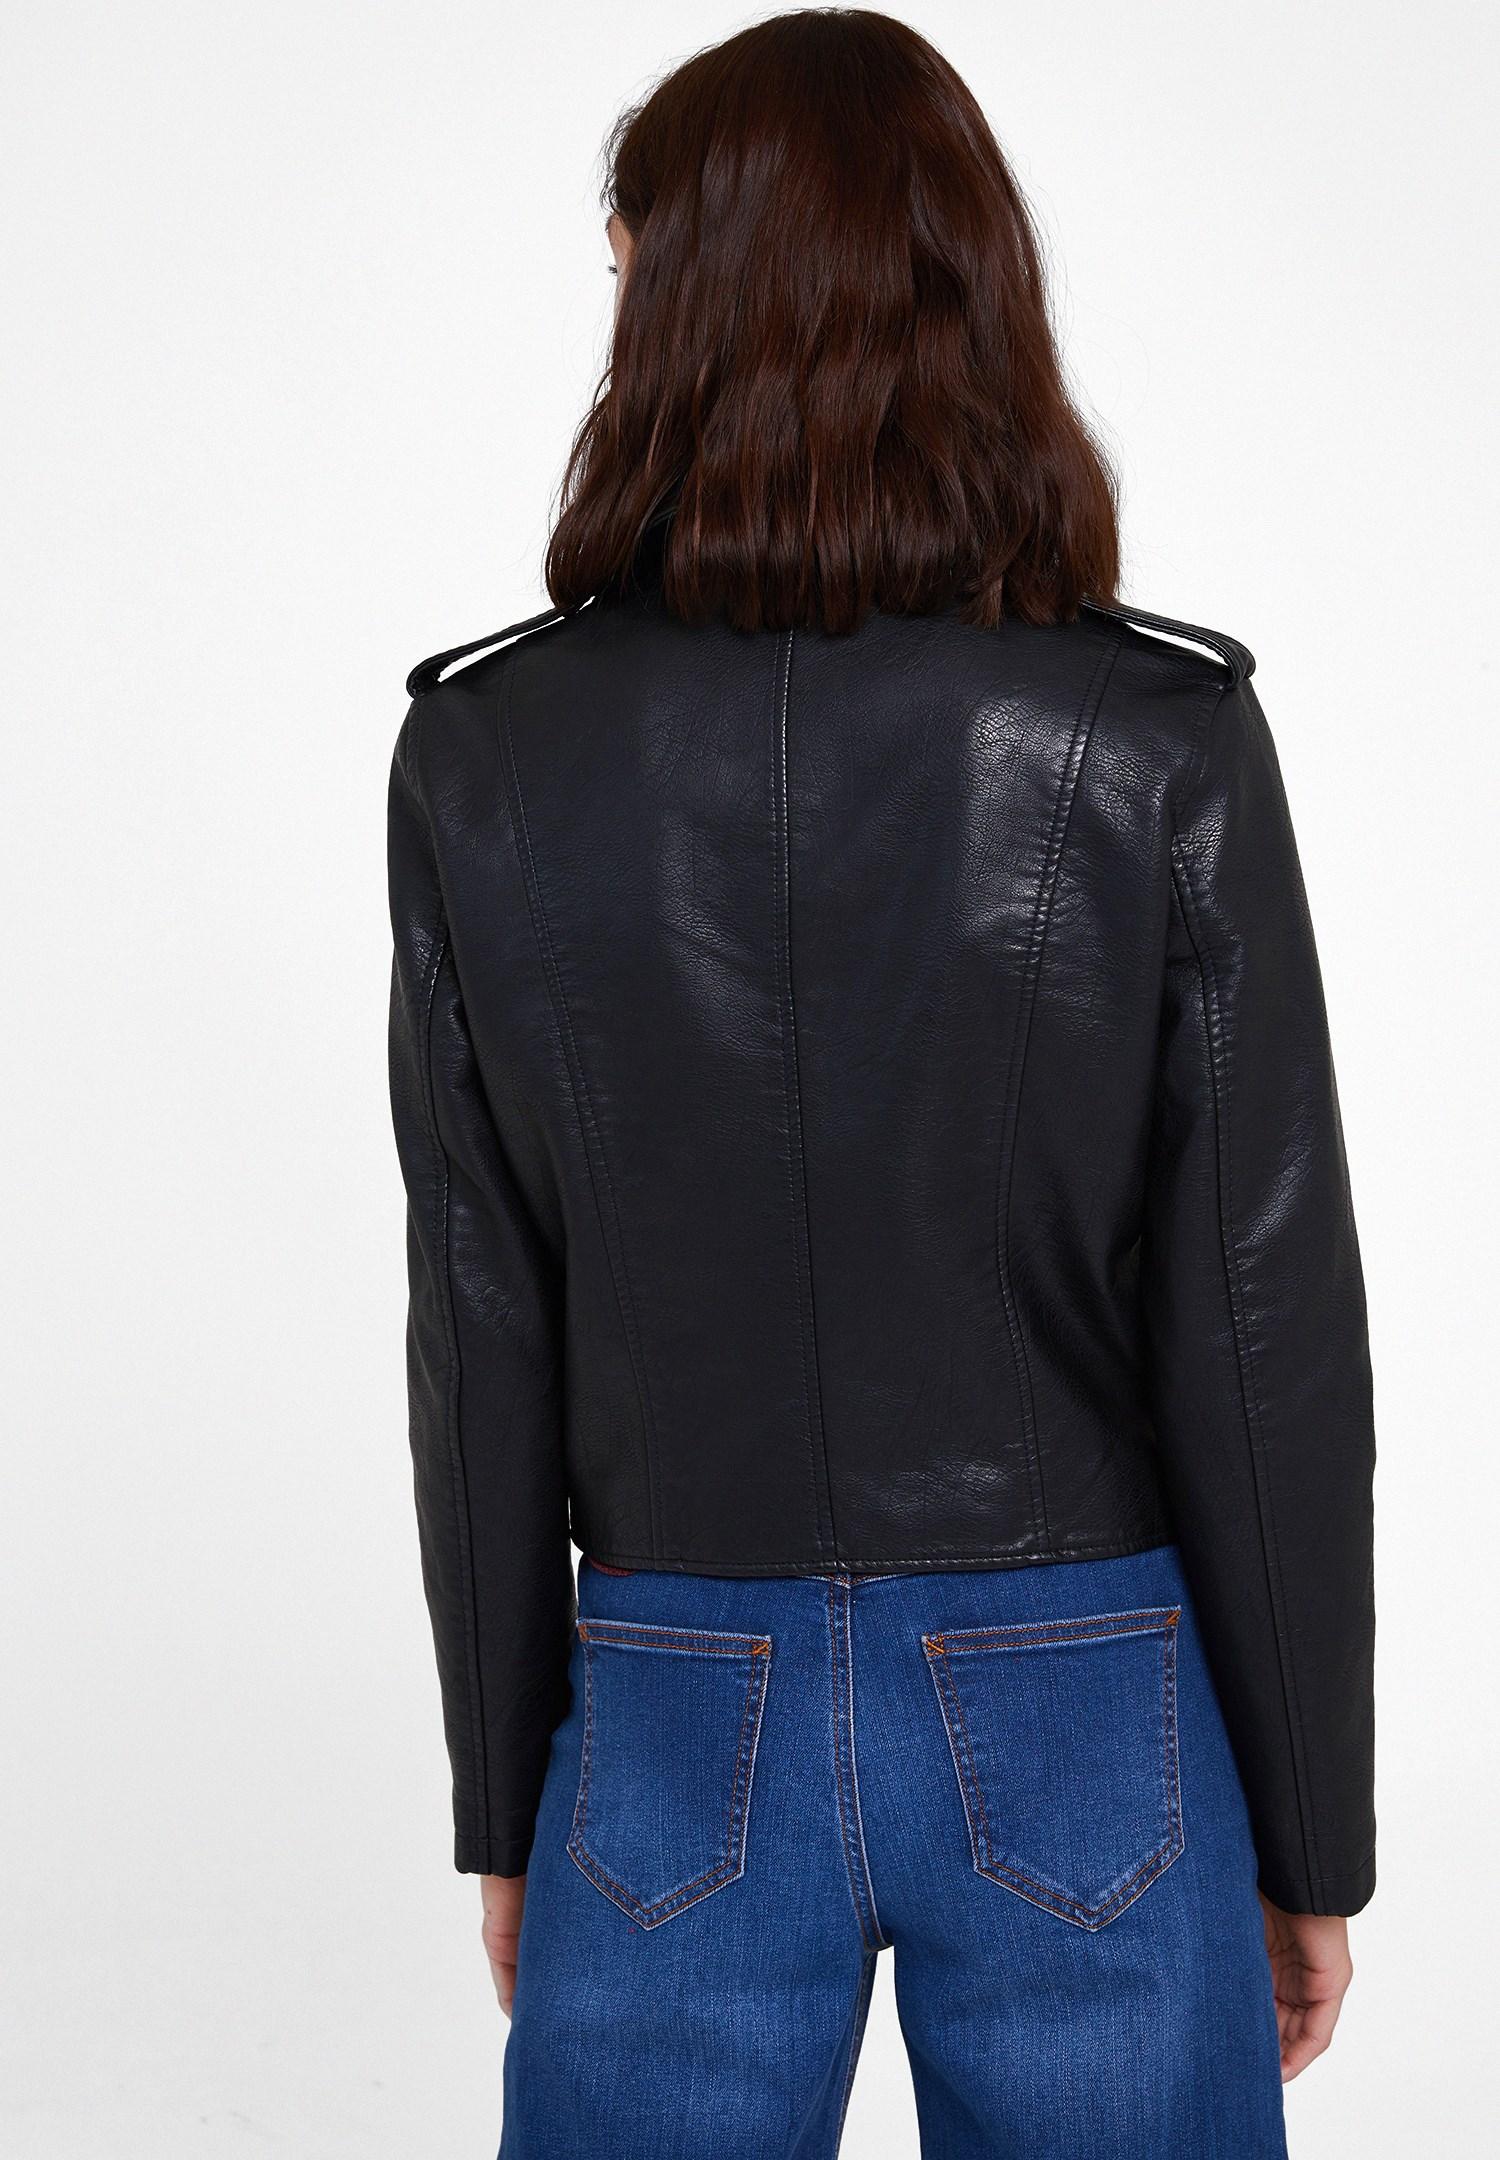 Women Black Biker Leather Jacket with Detail